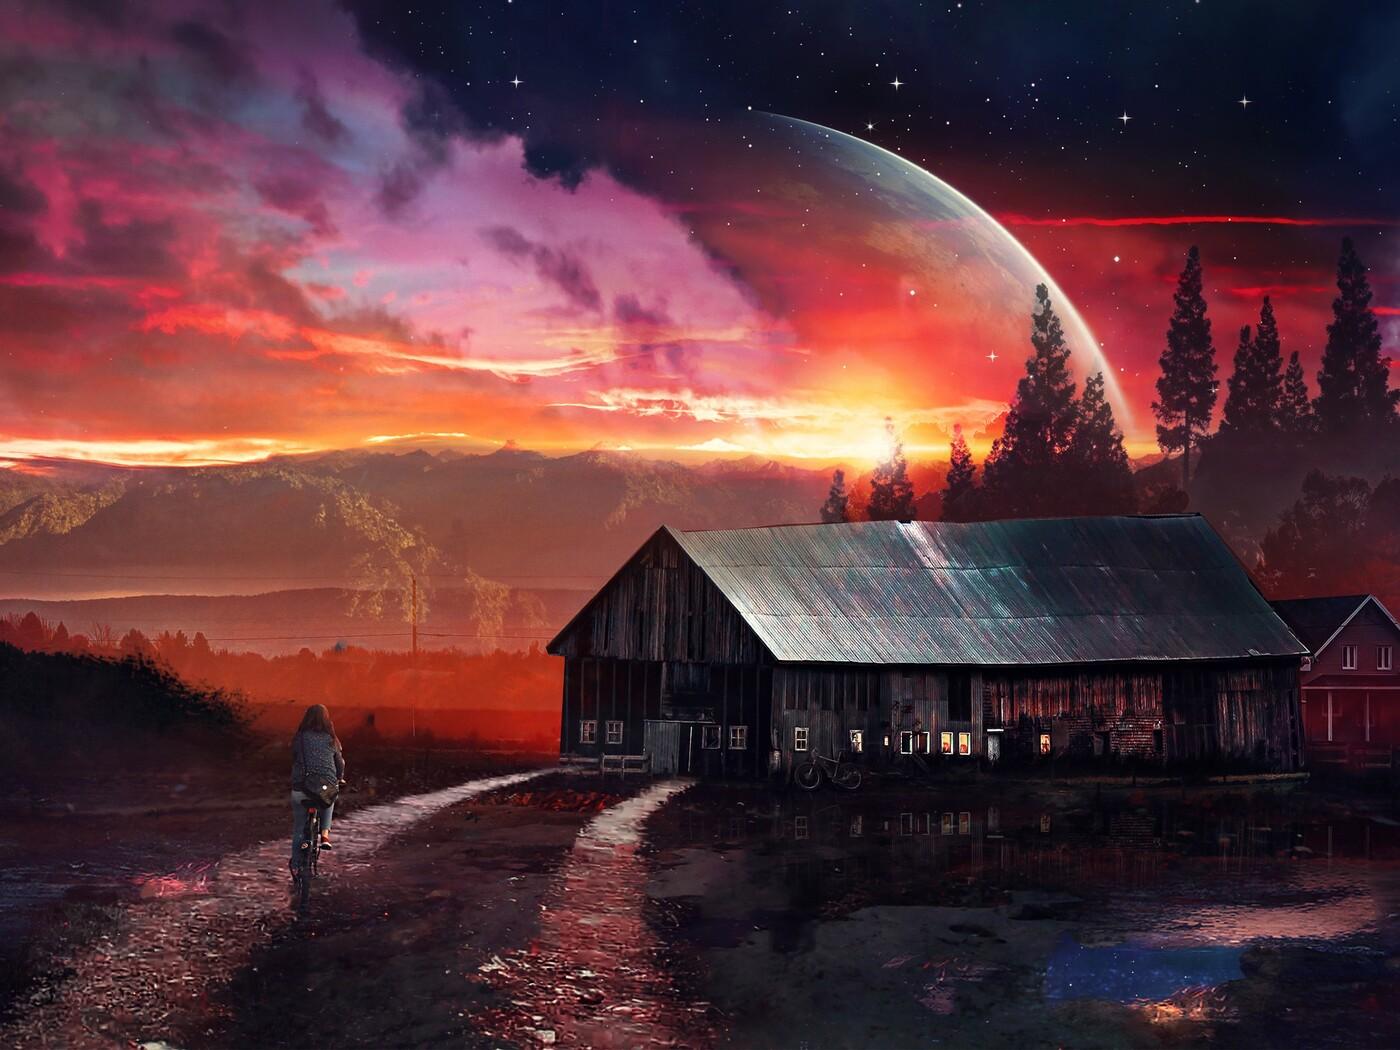 star-home-planets.jpg